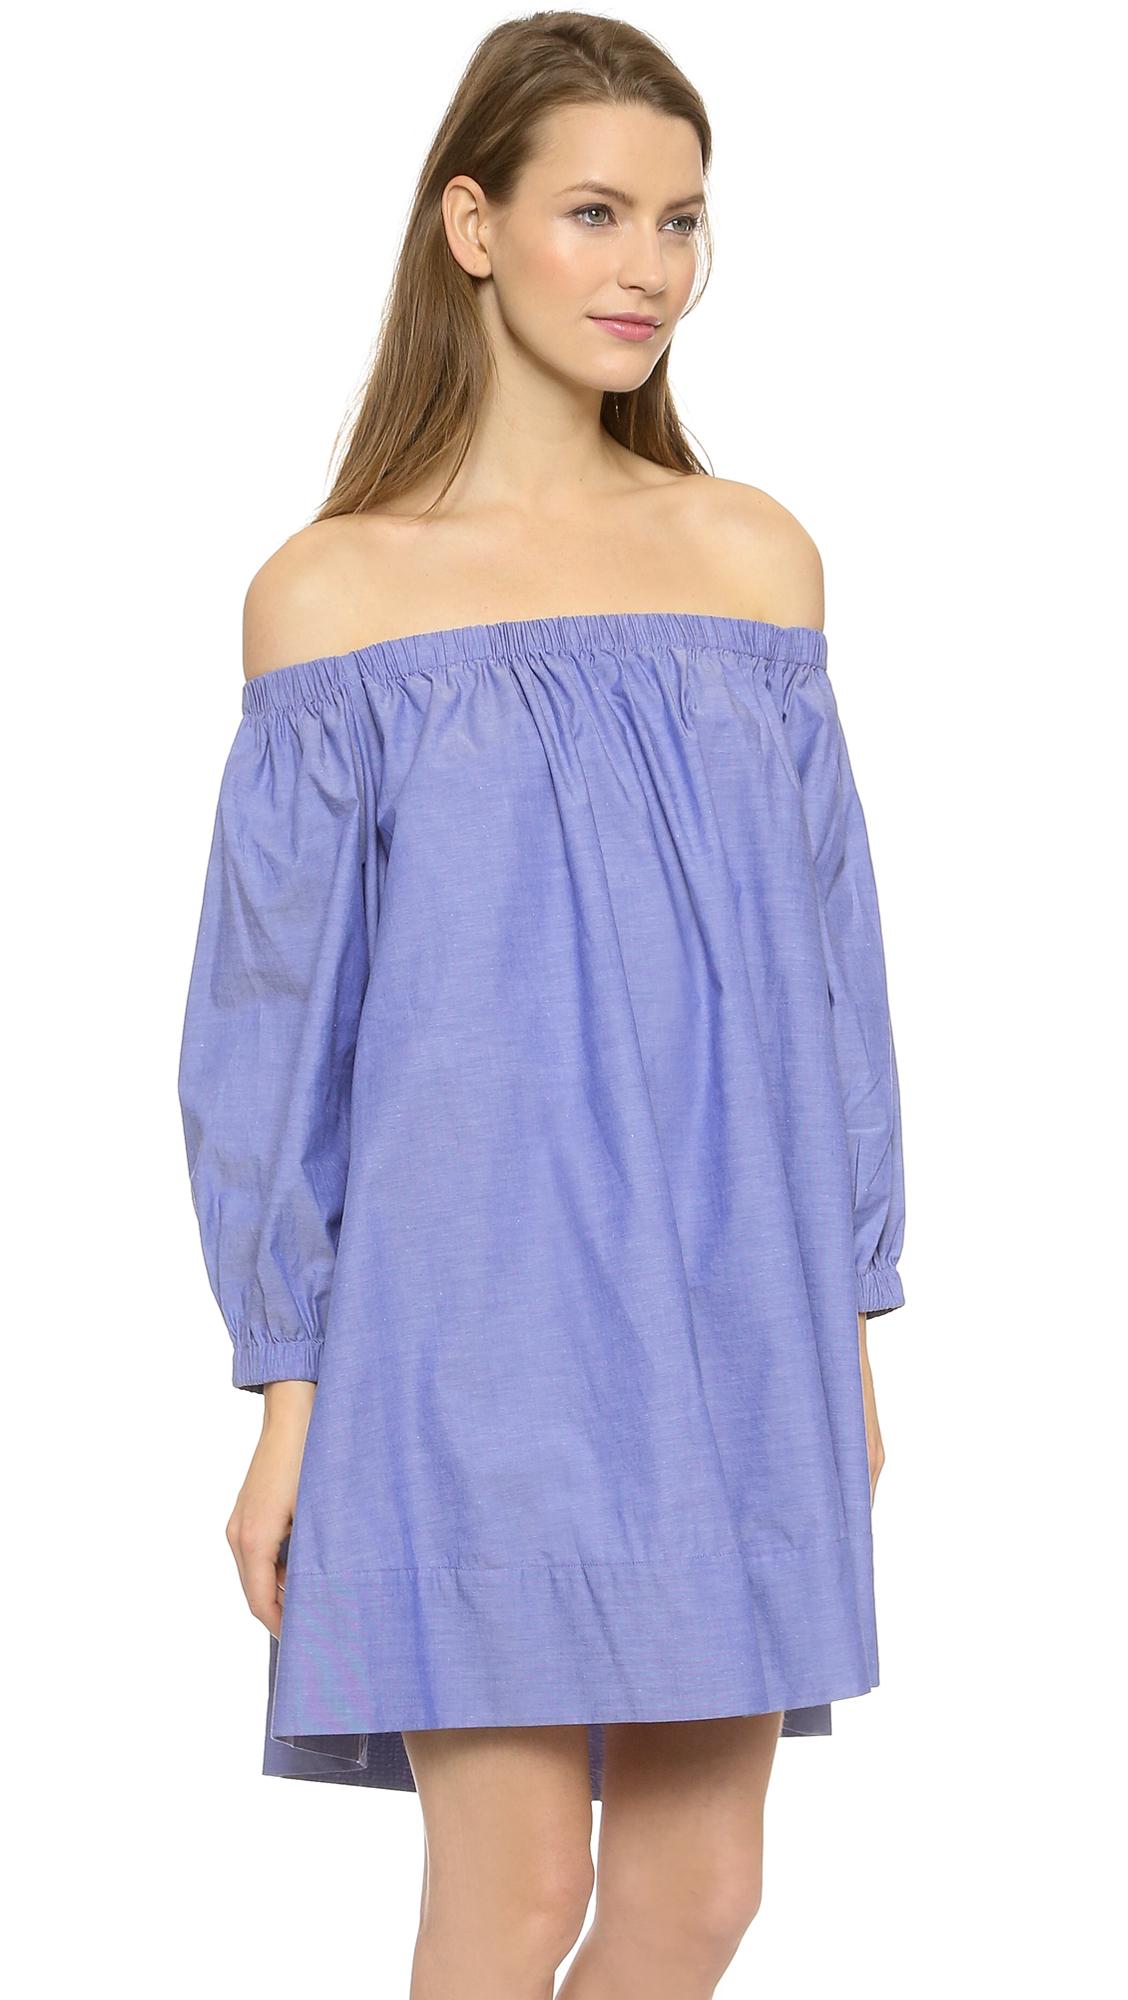 Cynthia Rowley Cotton Voile Peasant Dress White In Blue